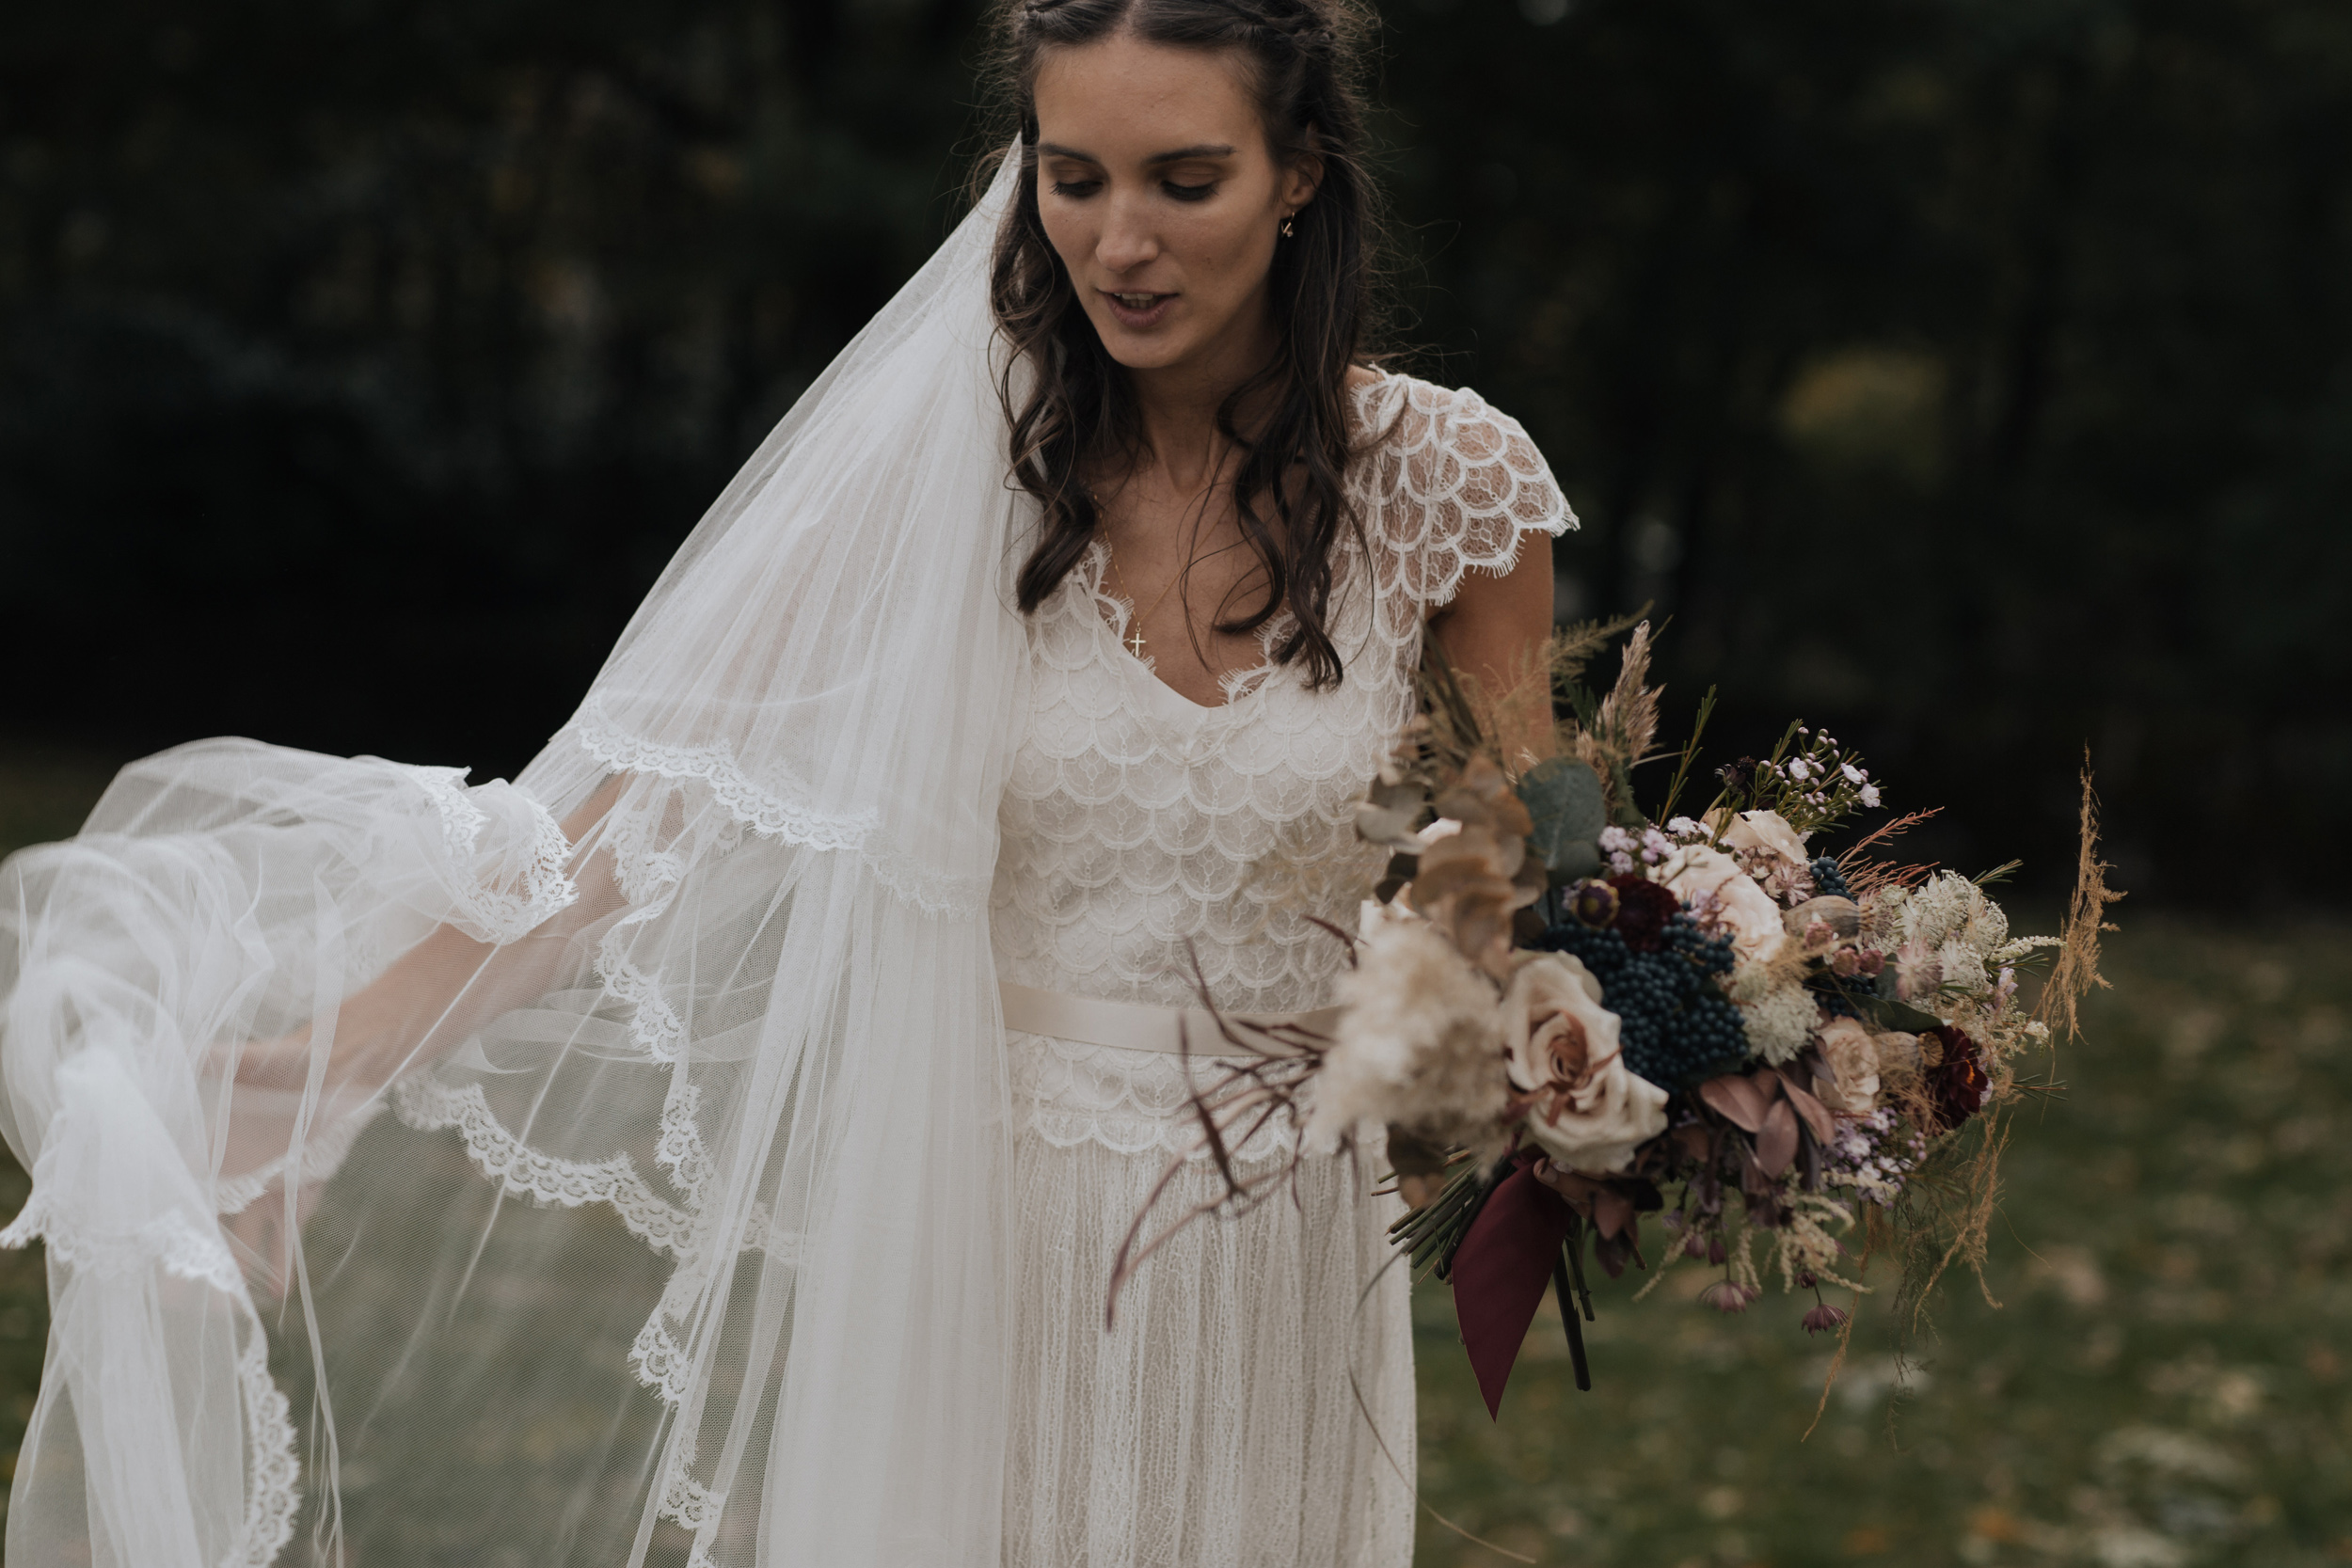 Joasia-Kate-Beaumont-Bohemian-Lace-Wedding-Dress-Peak-District-Sheffield-Wedding-48.jpg